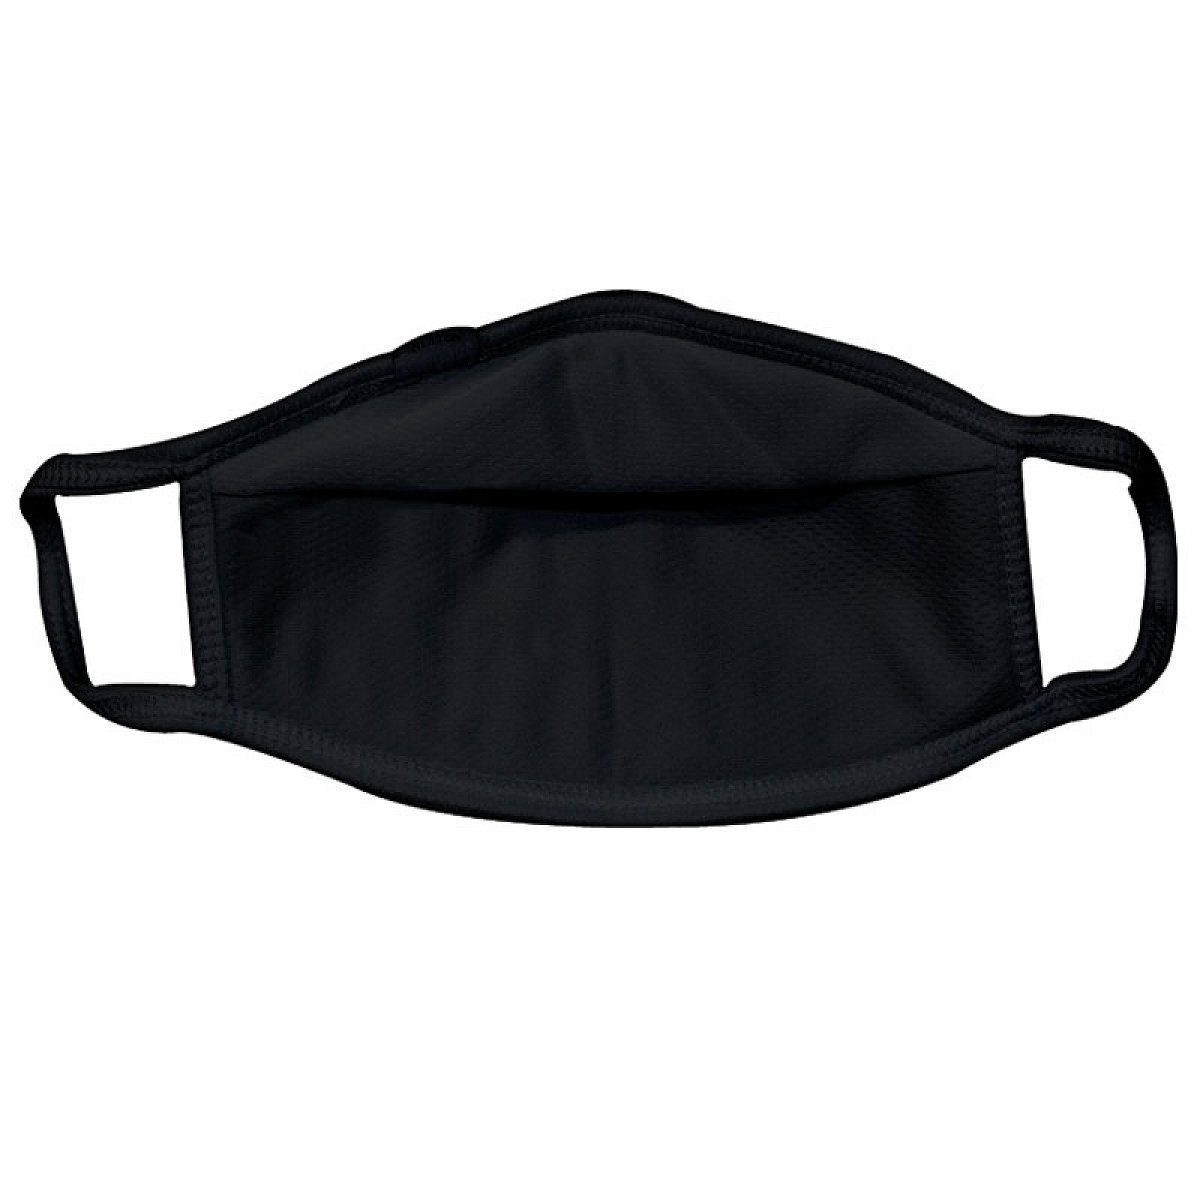 Protective mask, black